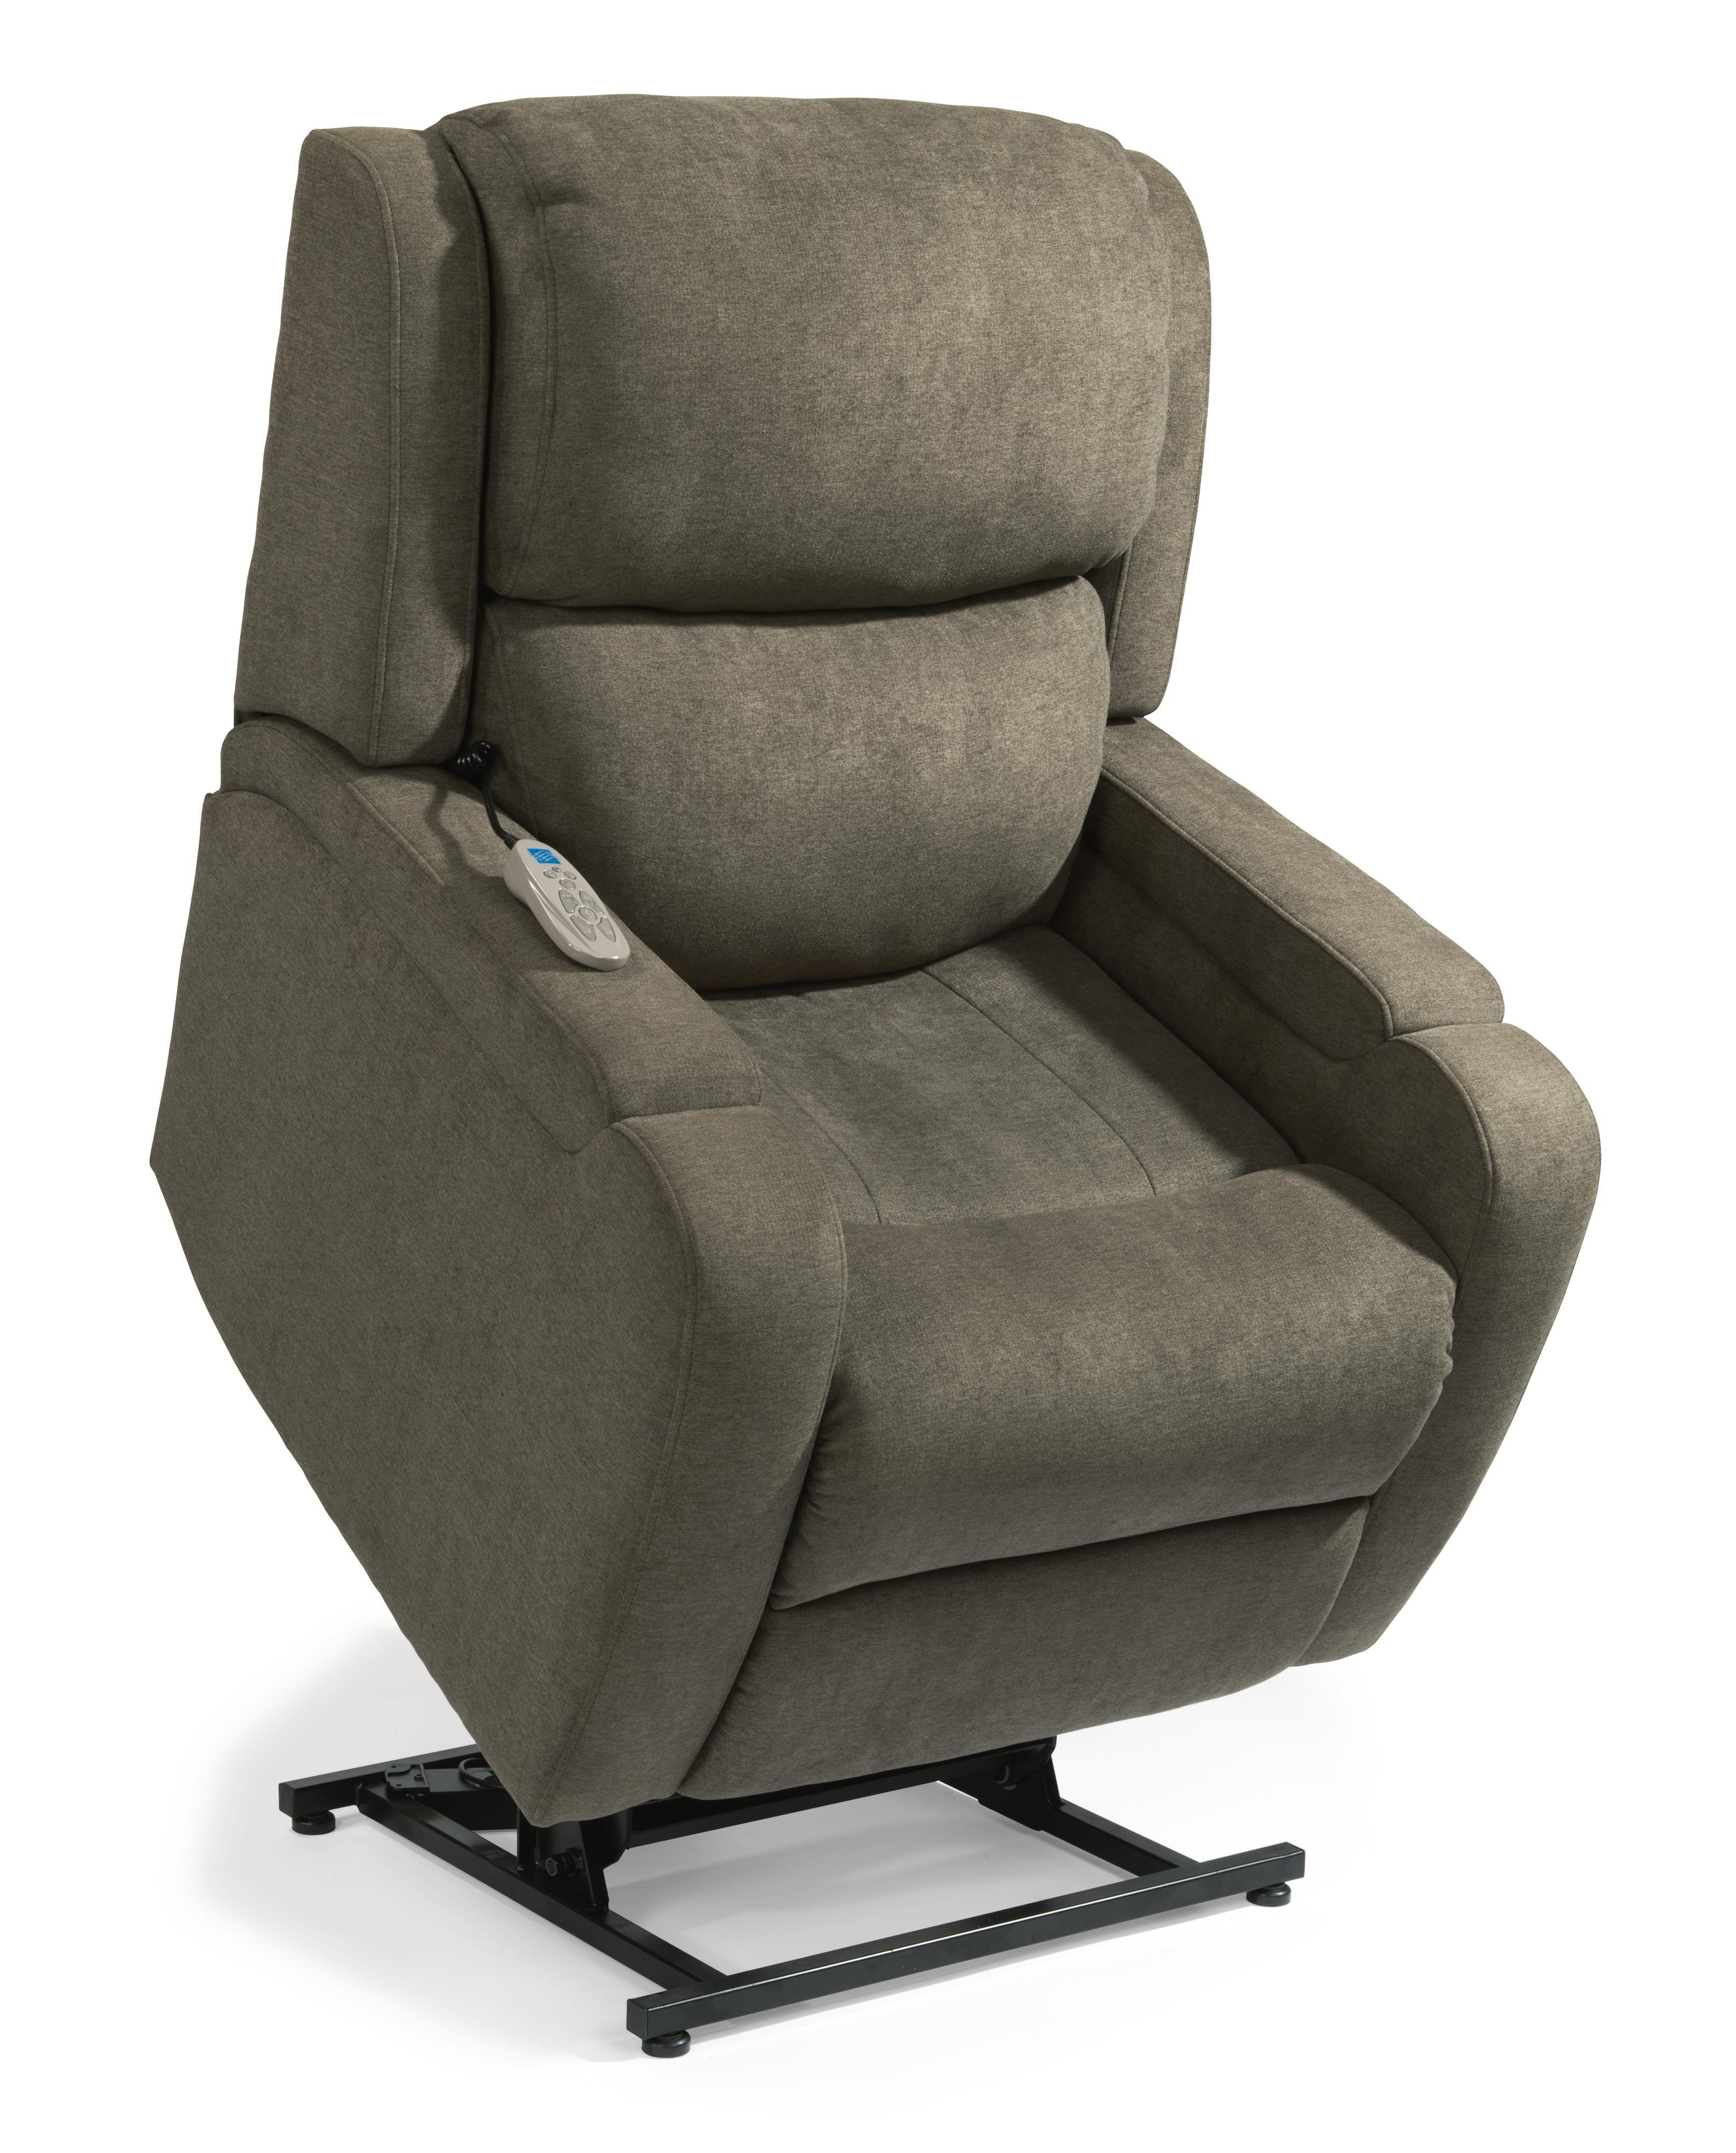 Flexsteel Latitudes Lift Chairs Melody Infinite Position